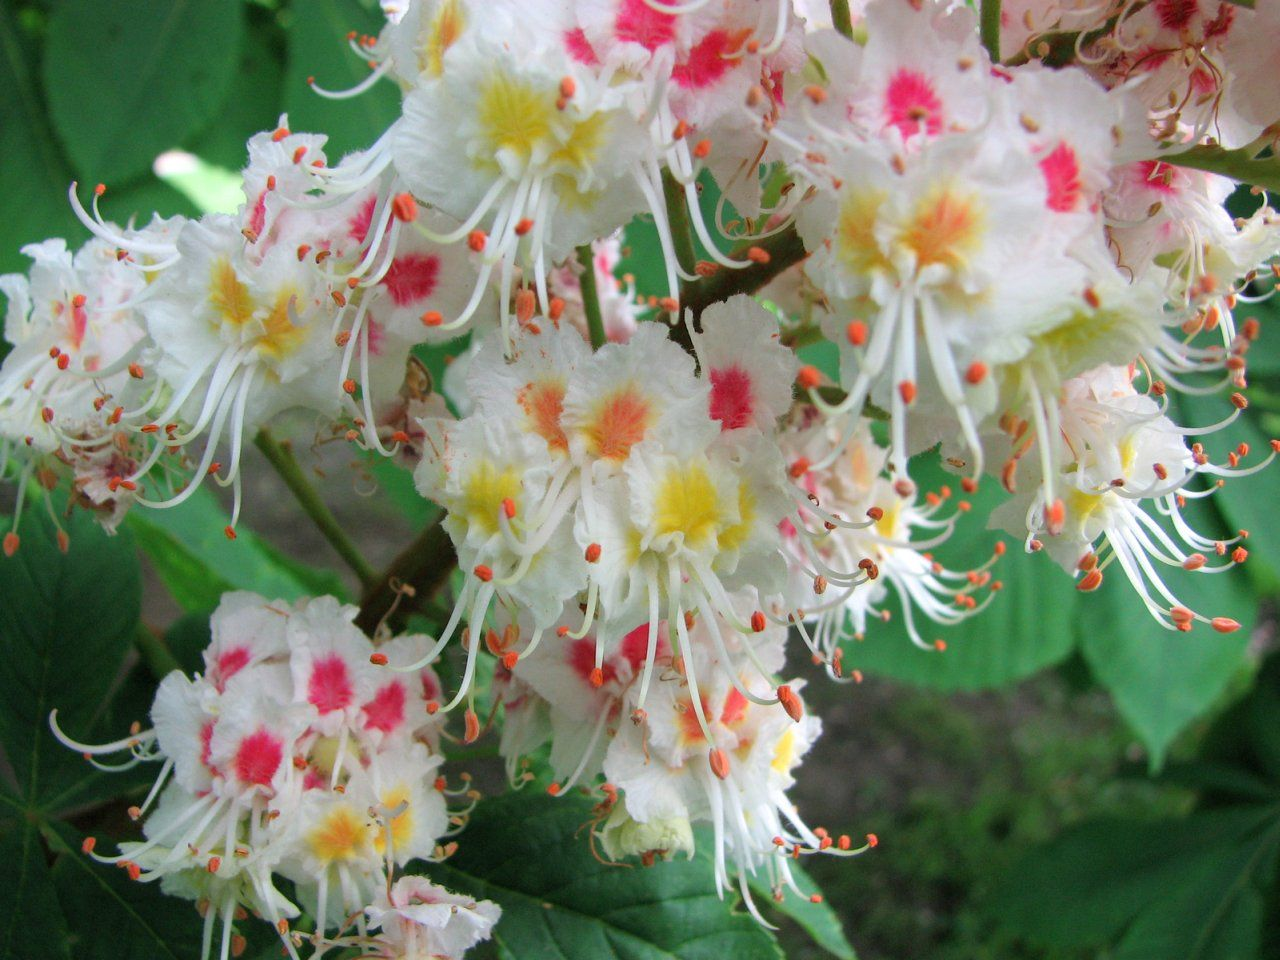 Desvre lotus flowers and flowers garden desvre flowering treesdeciduous izmirmasajfo